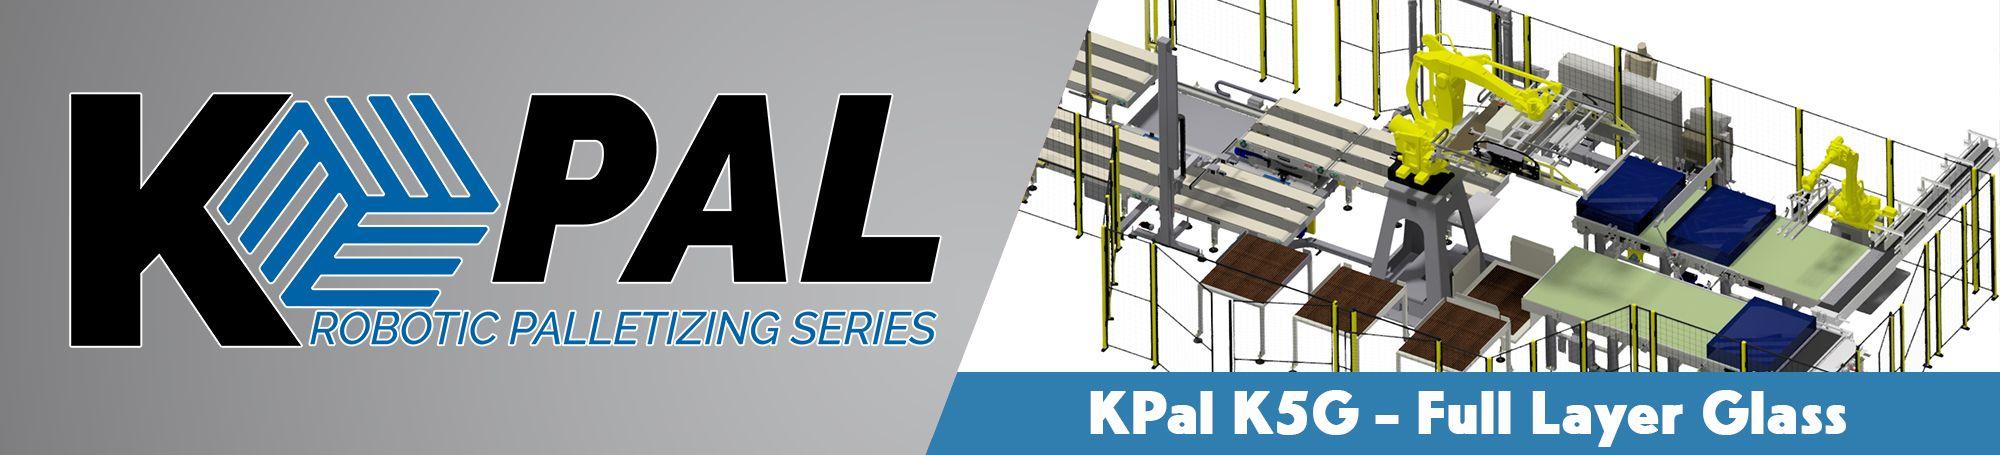 KPal Full Layer Glass copy.jpg